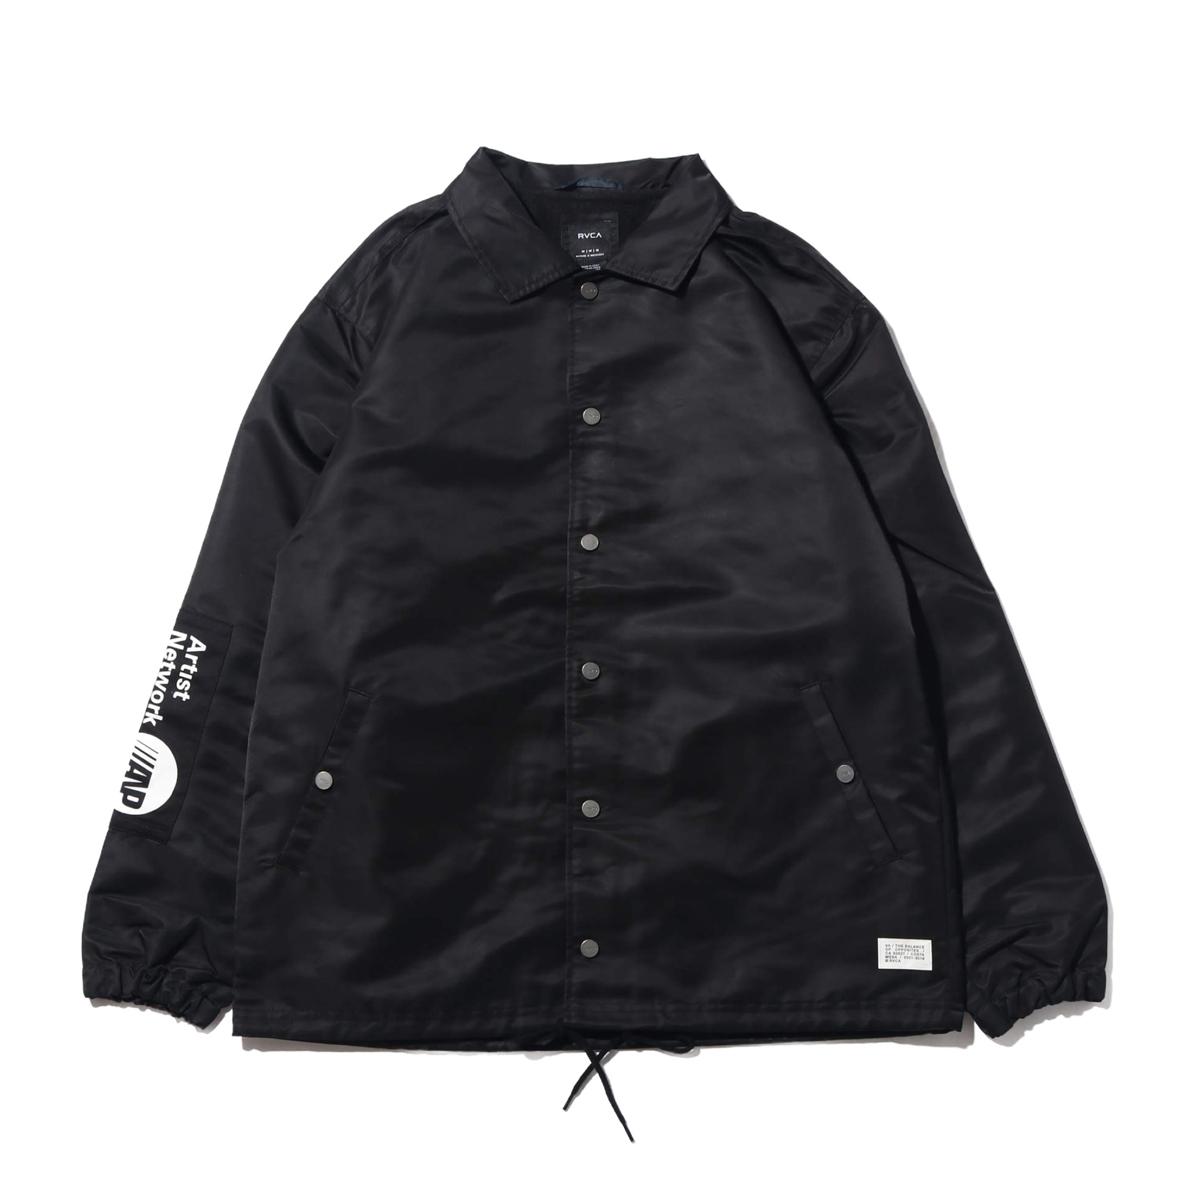 RVCA PATCH JACKET(BLACK)(ルーカ パッチ ジャケット)【メンズ】【ジャケット】【19FA-I】